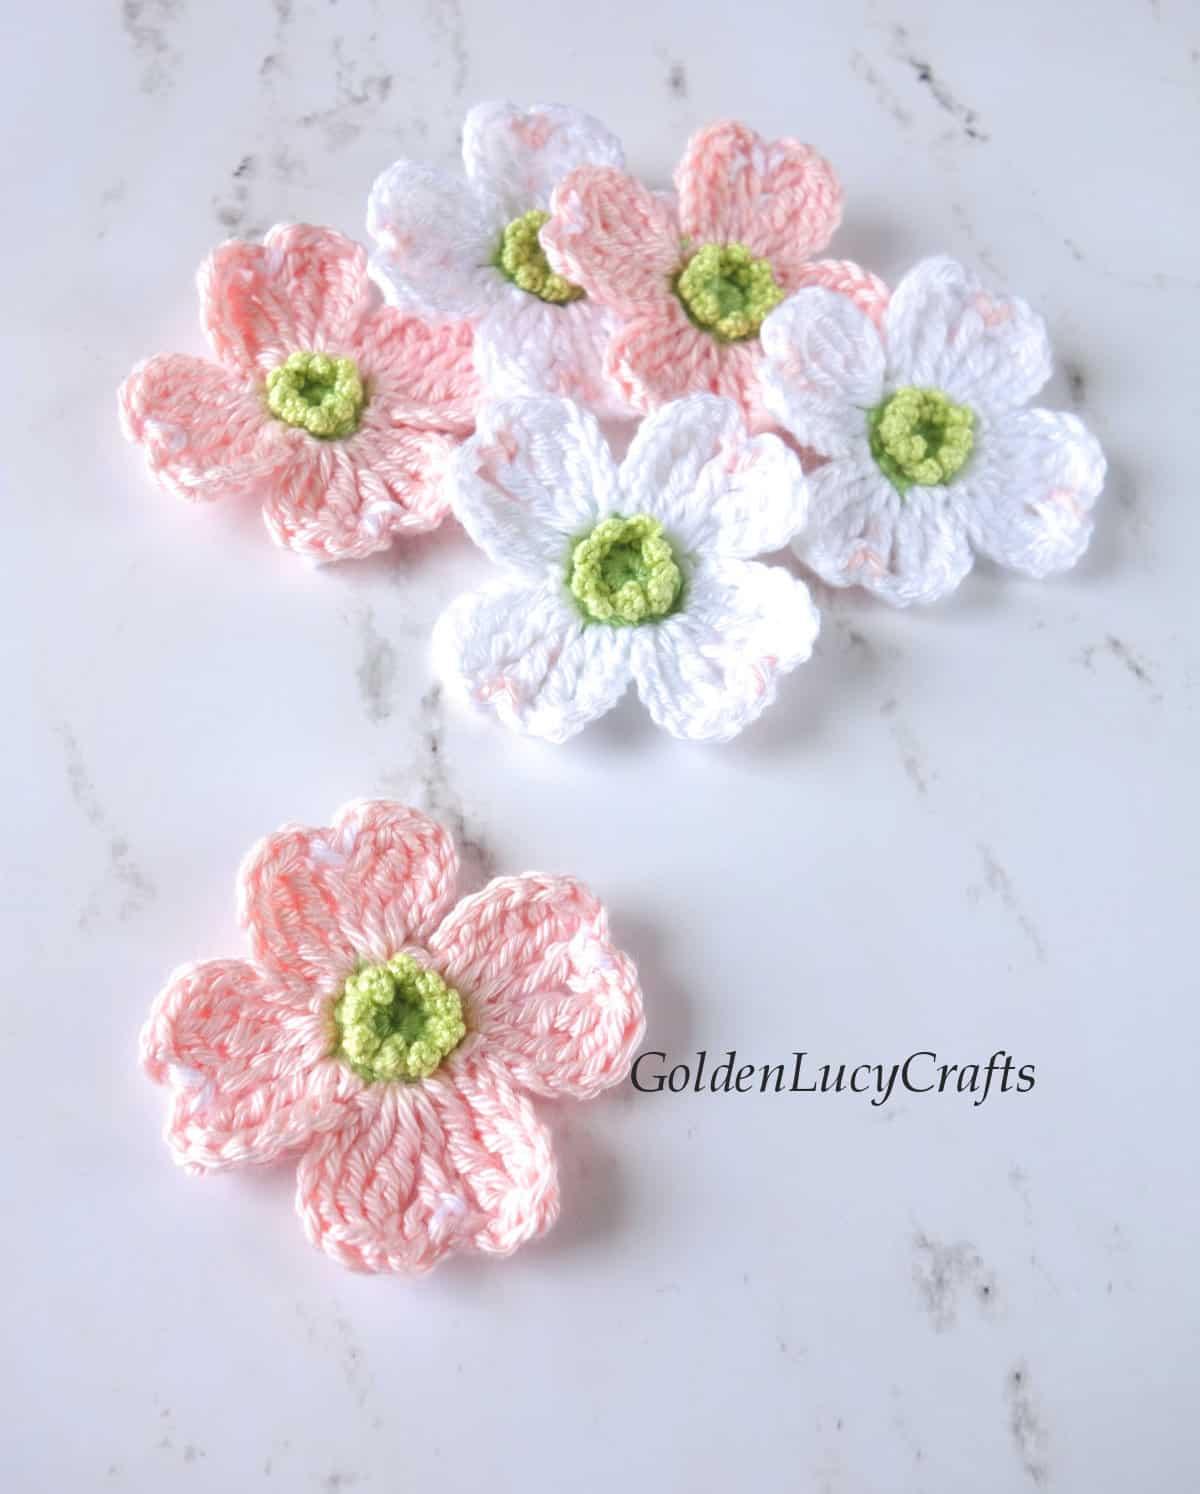 Crochet dogwood flowers.